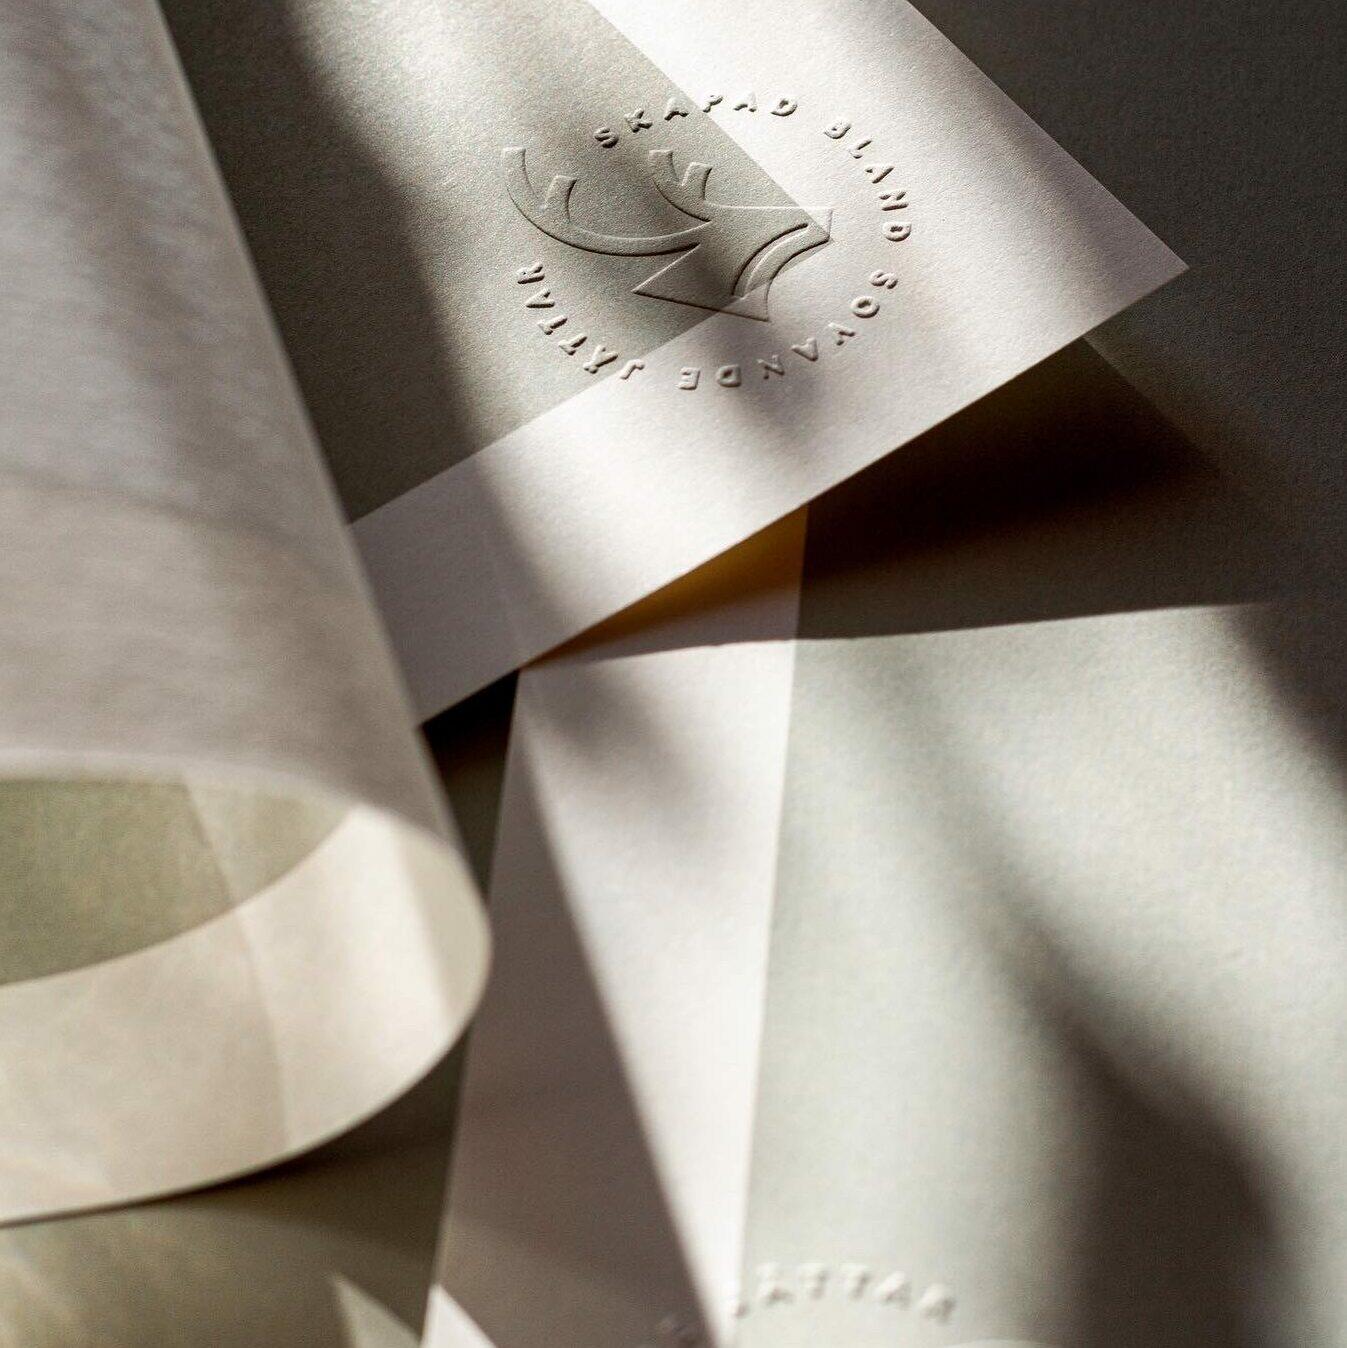 Fjelltopp motifs printed.